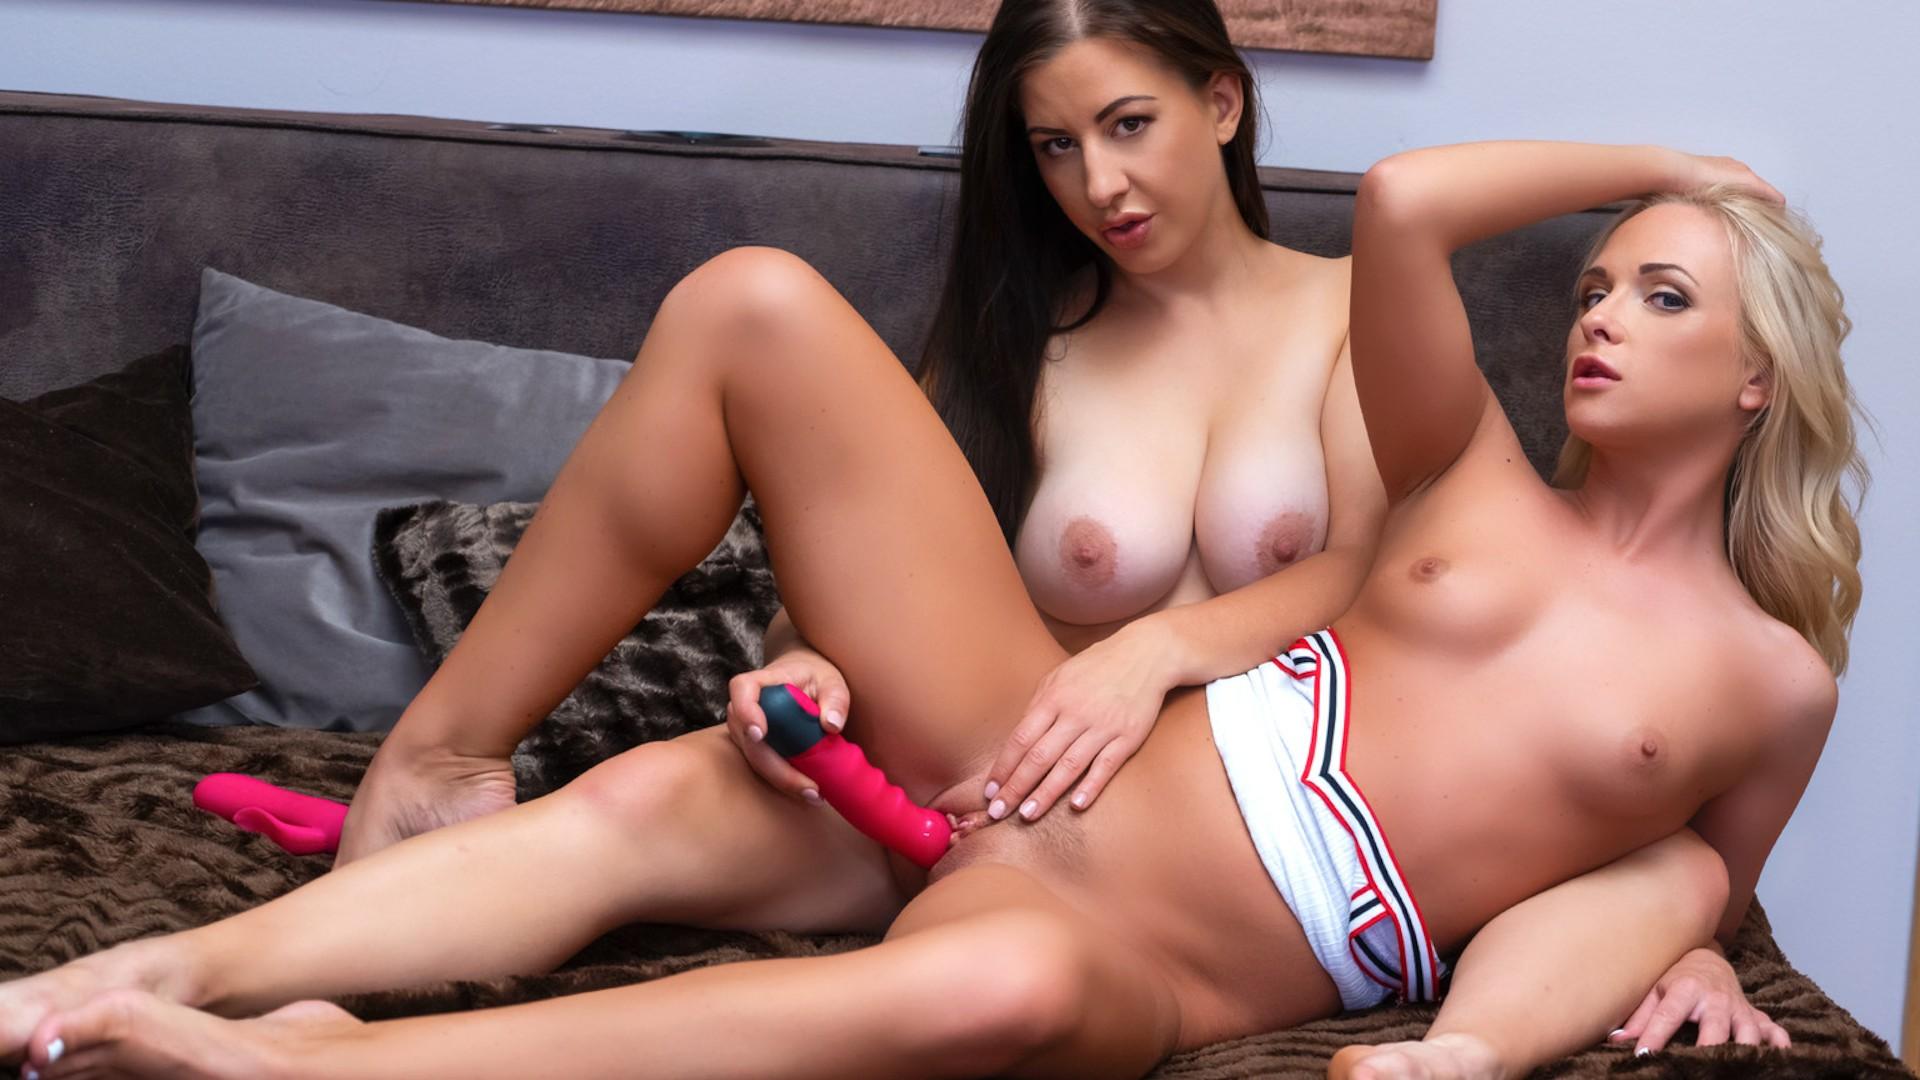 Horny girlfriends erotic tryst - Lesbea